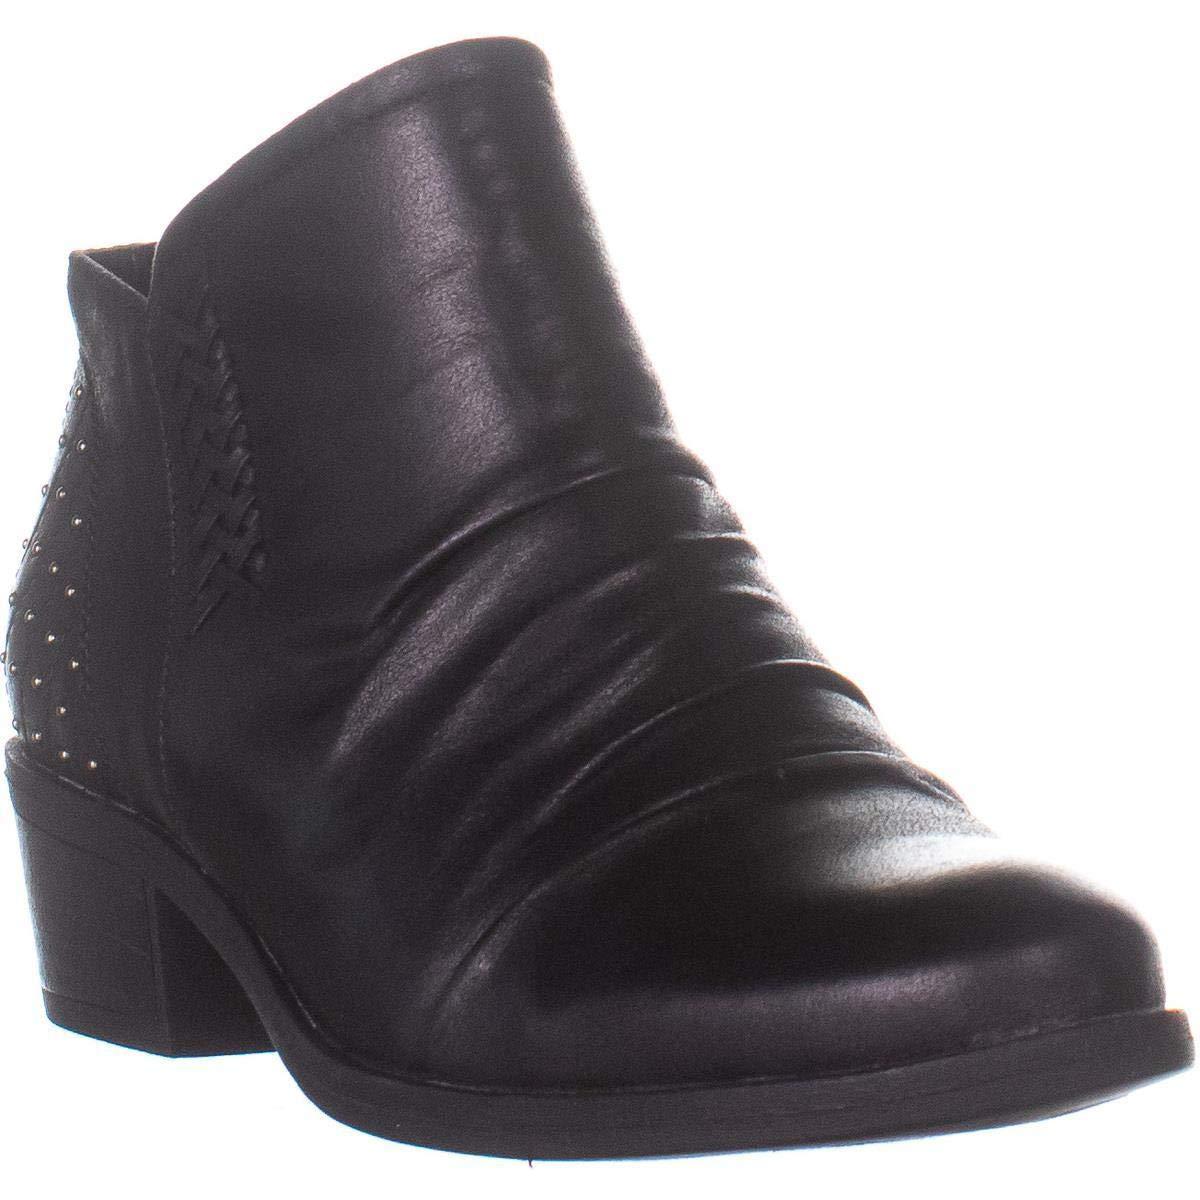 BareTraps Womens Gericka Almond Toe Ankle Fashion Boots Black Size 9.5